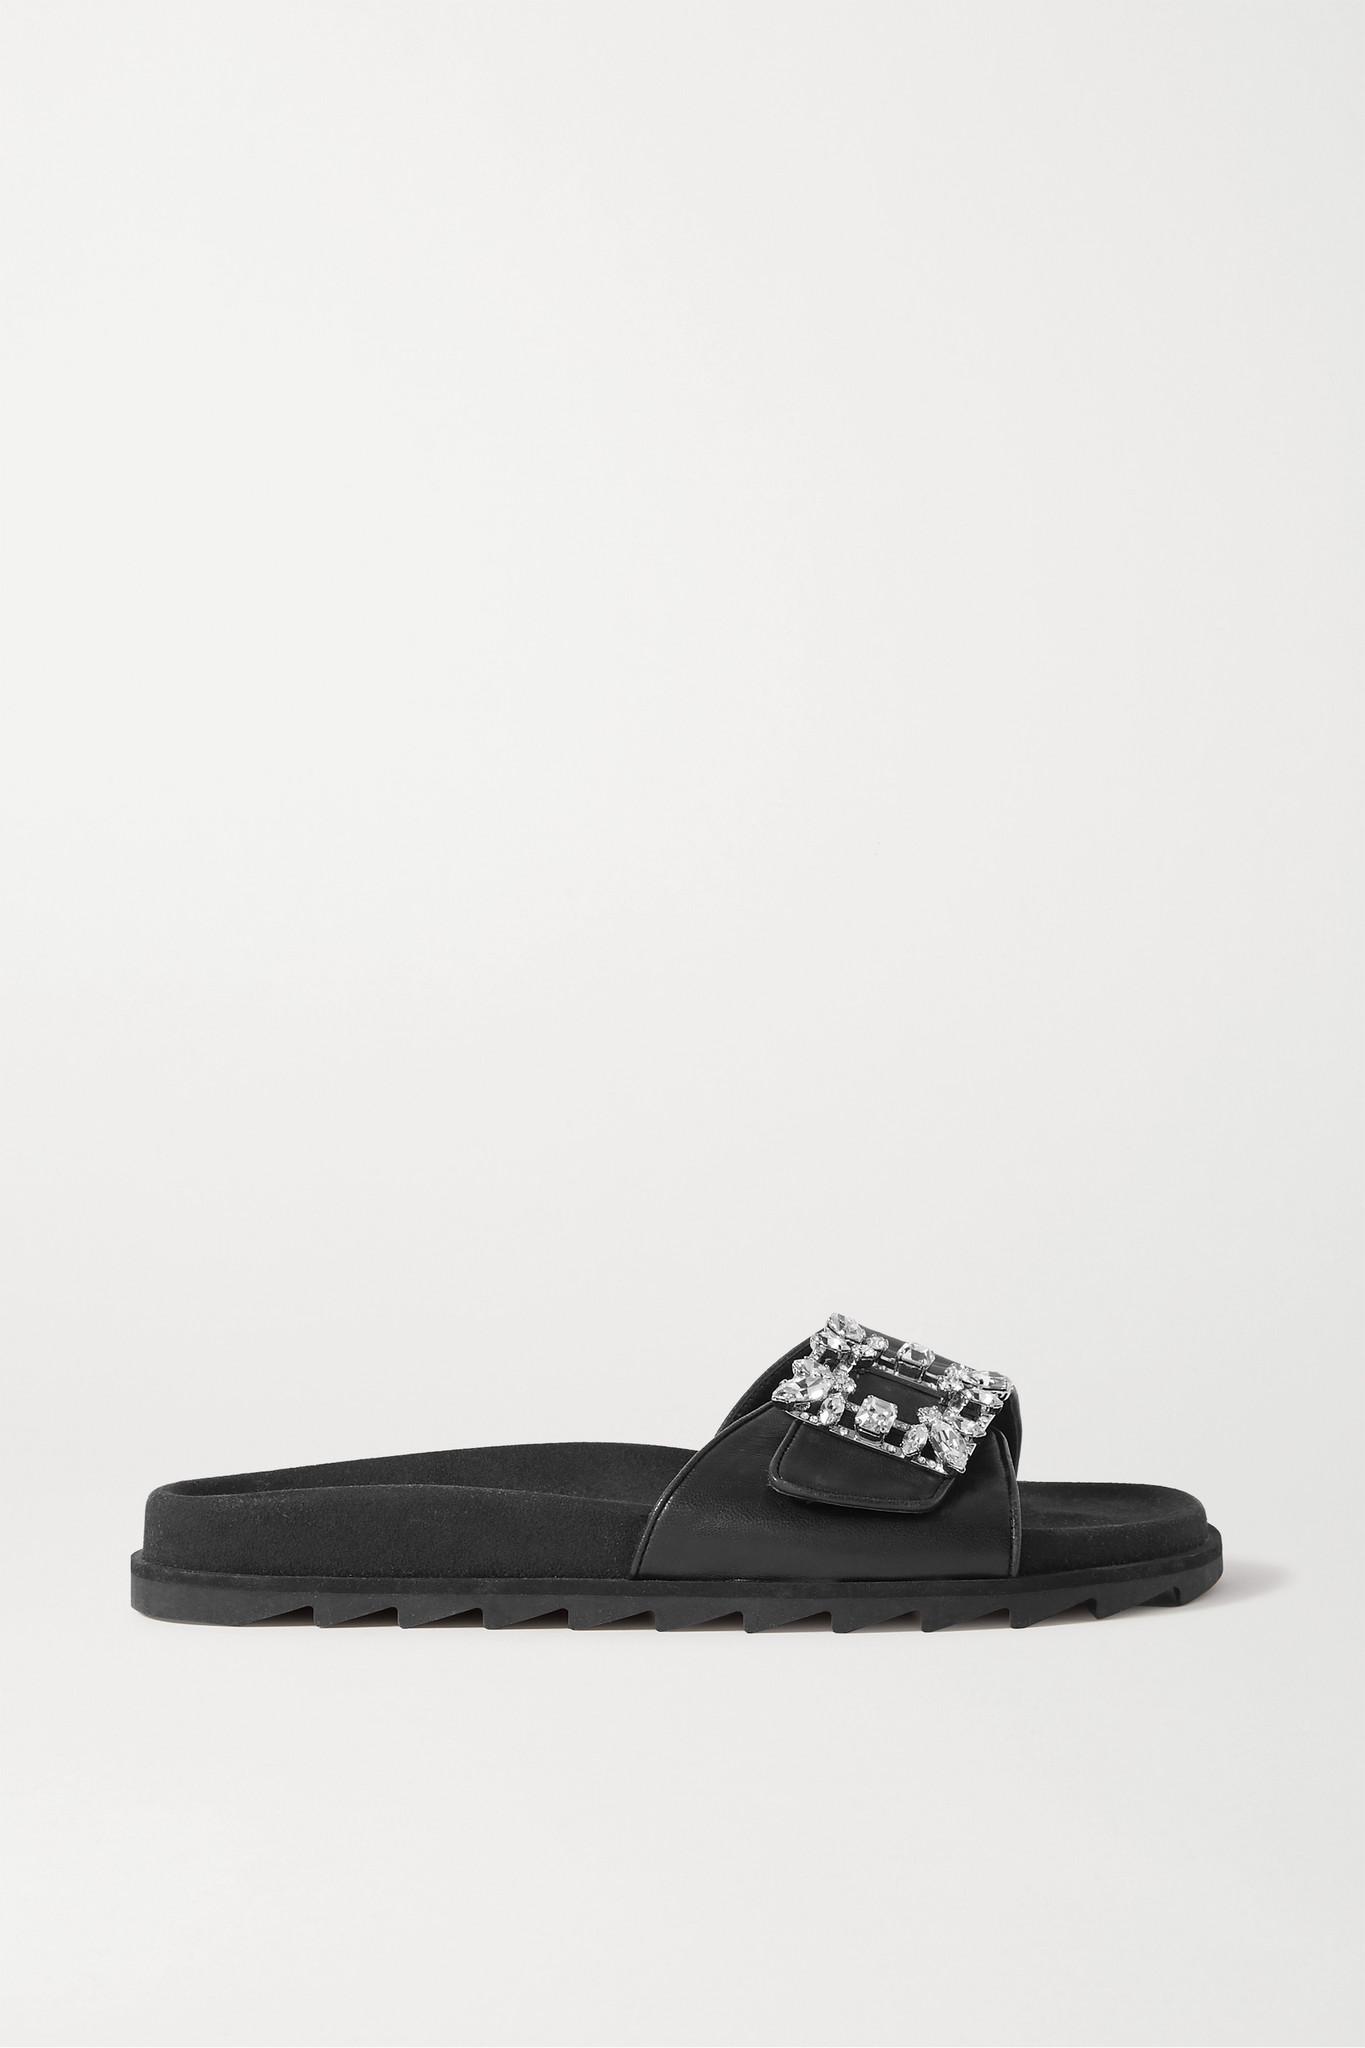 ROGER VIVIER - Slidy 水晶缀饰皮革拖鞋 - 黑色 - IT38